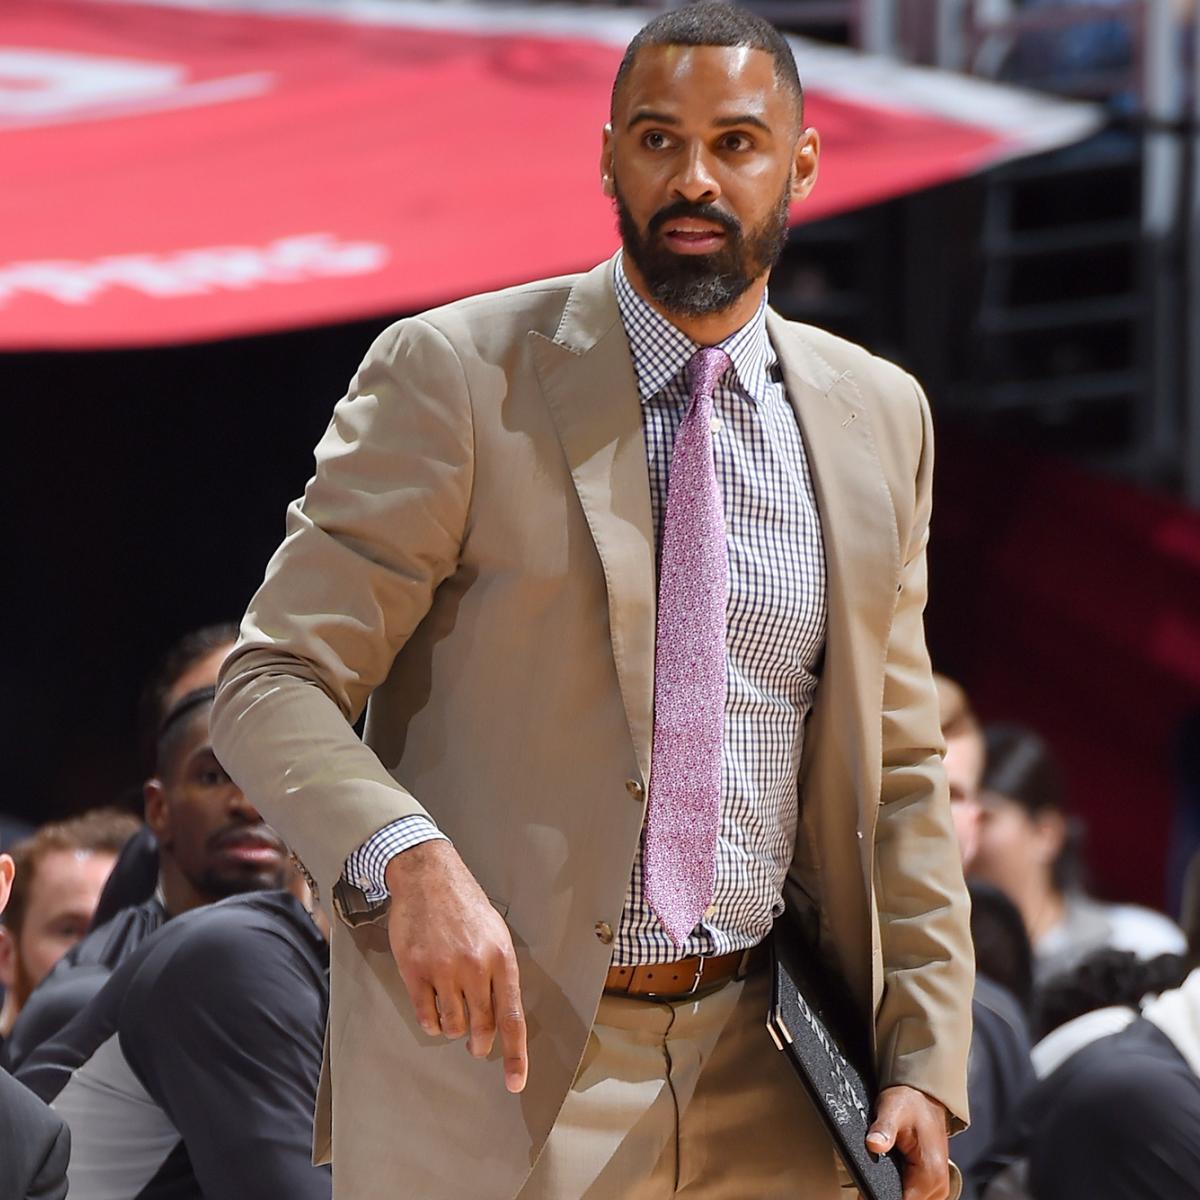 Portland Trail Blazers Coaching Staff: Pistons HC Rumors: Ime Udoka To Interview, Dwane Casey